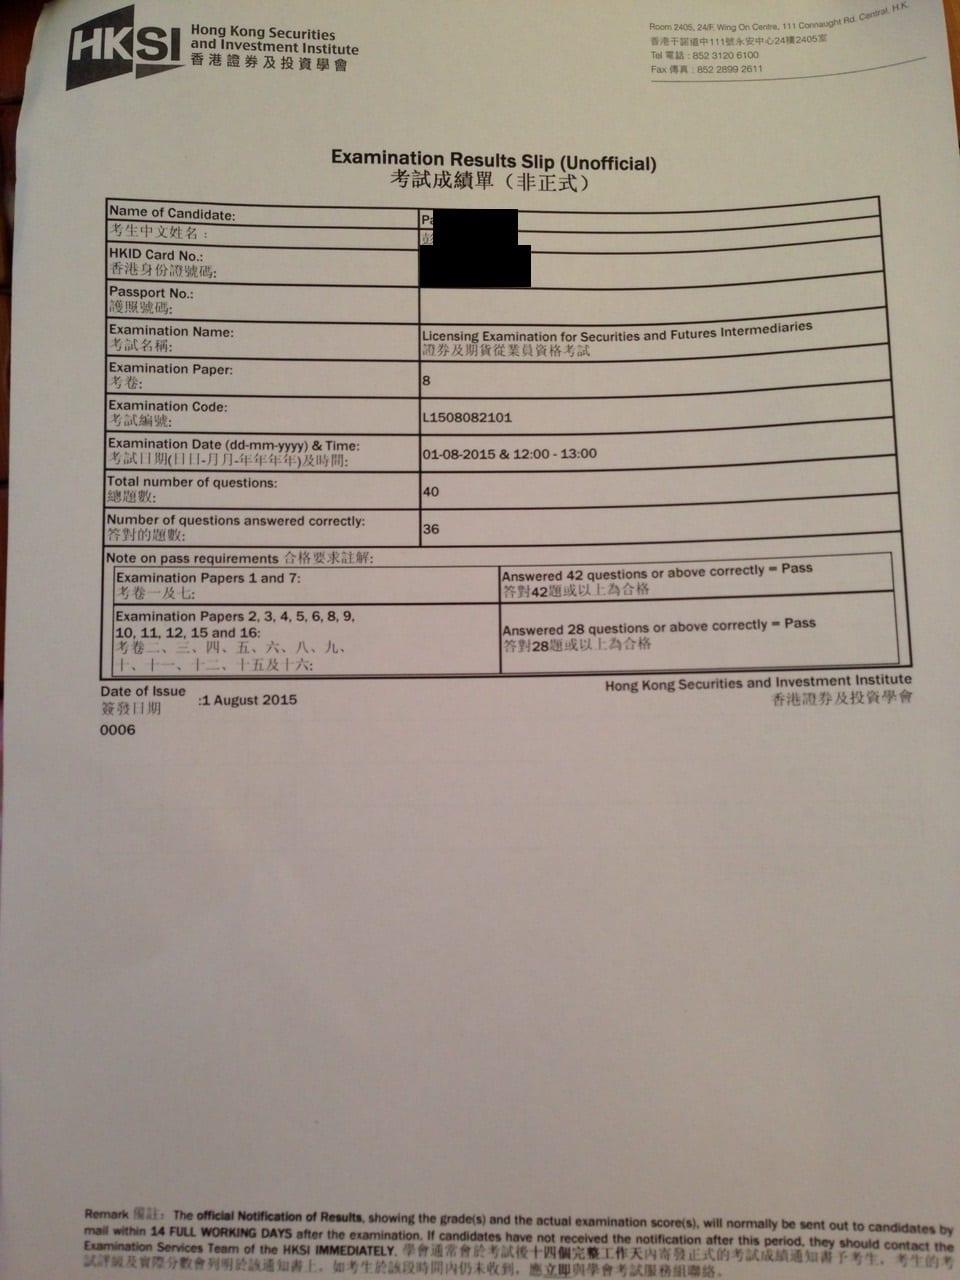 Mcpang 1/8/2015 HKSI Paper 8 Pass